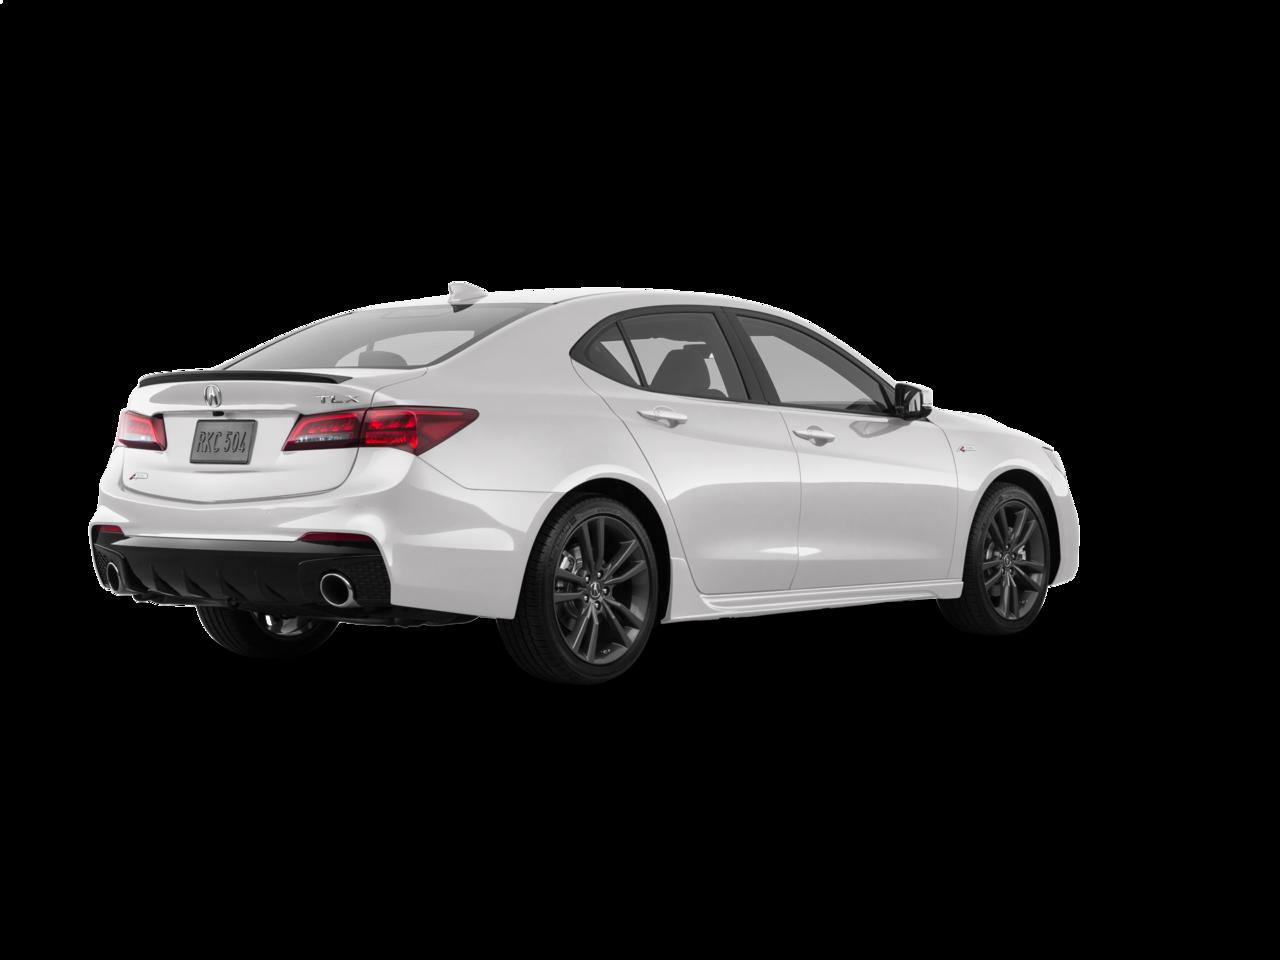 2018 Acura TLX A-Spec | Roadster.com